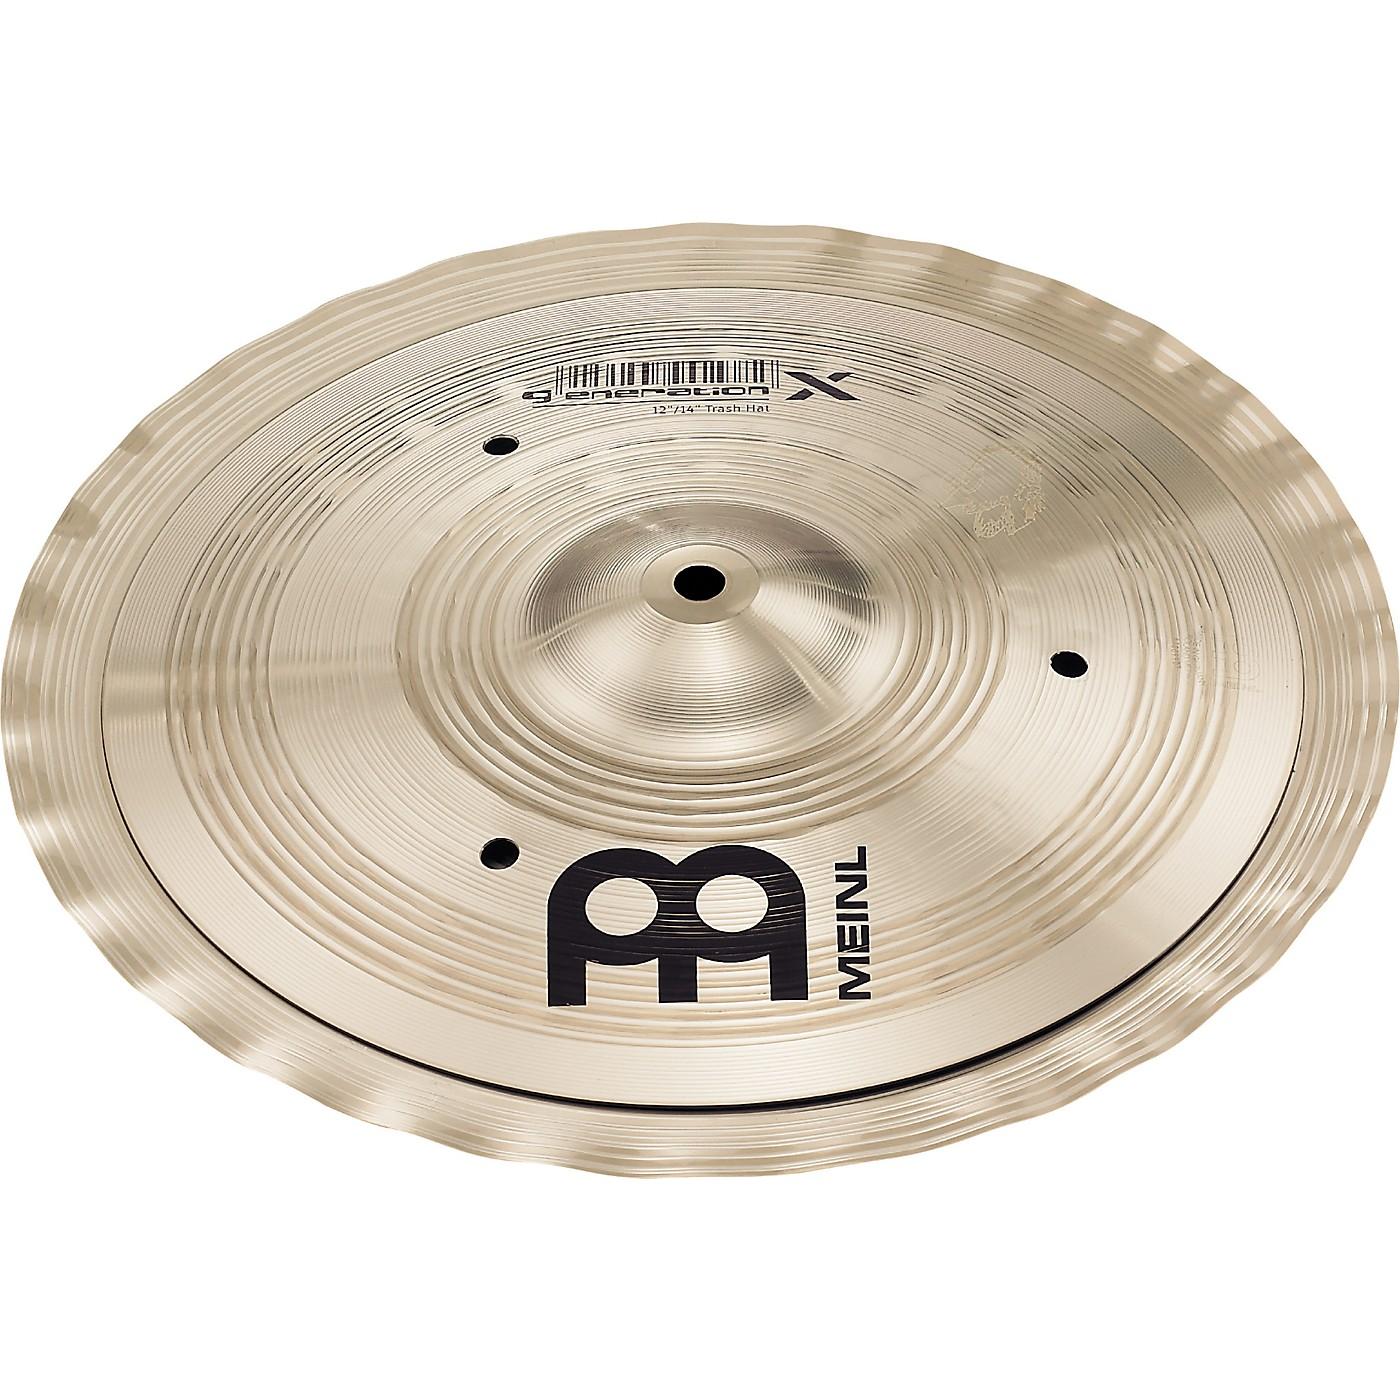 Meinl Generation X Signature Benny Greb Trash Hat Hi-Hat Effects Cymbal thumbnail